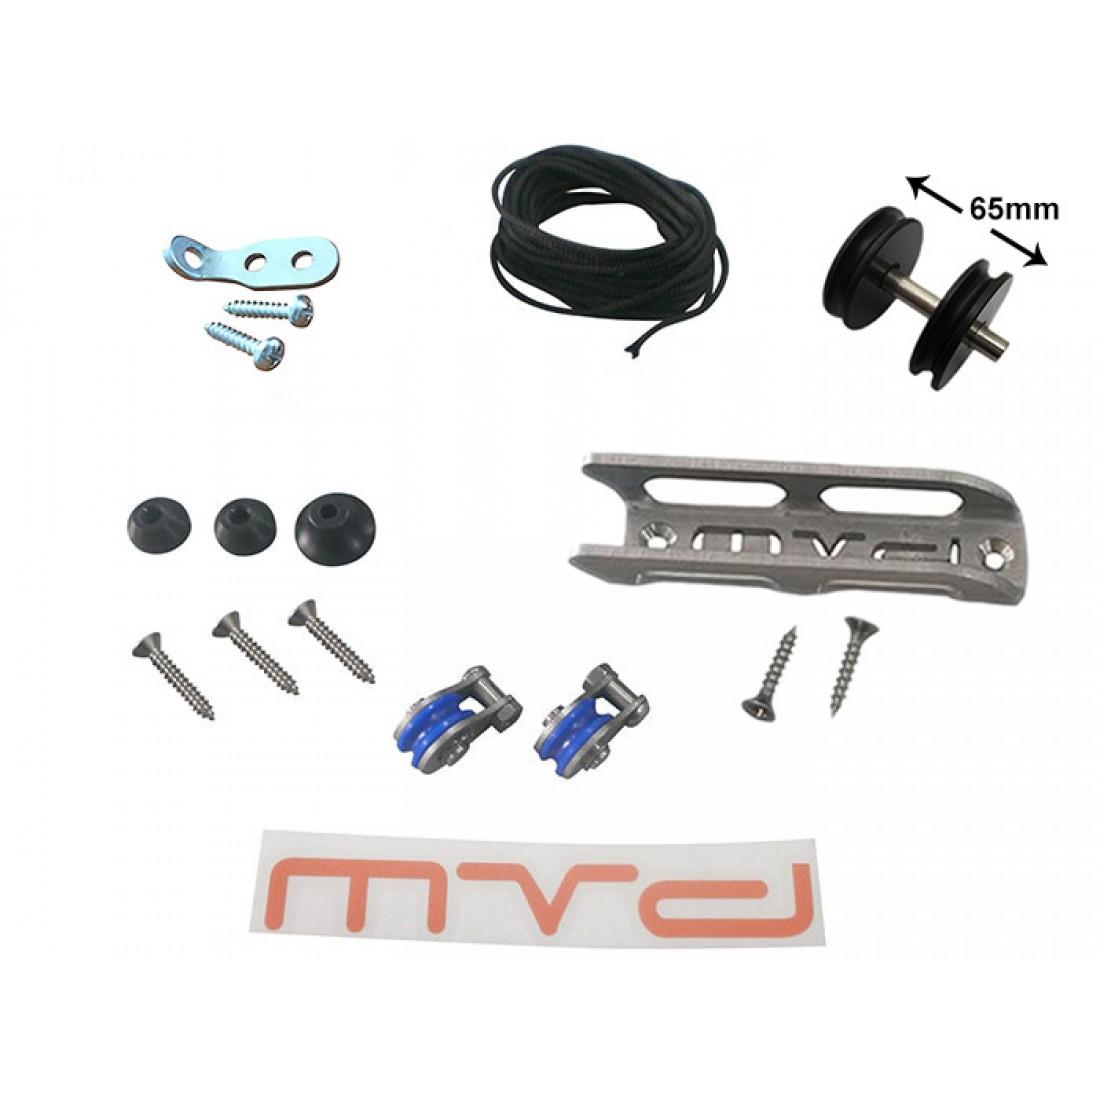 mvd_invert-roller-for-wood-kit-(no-head)